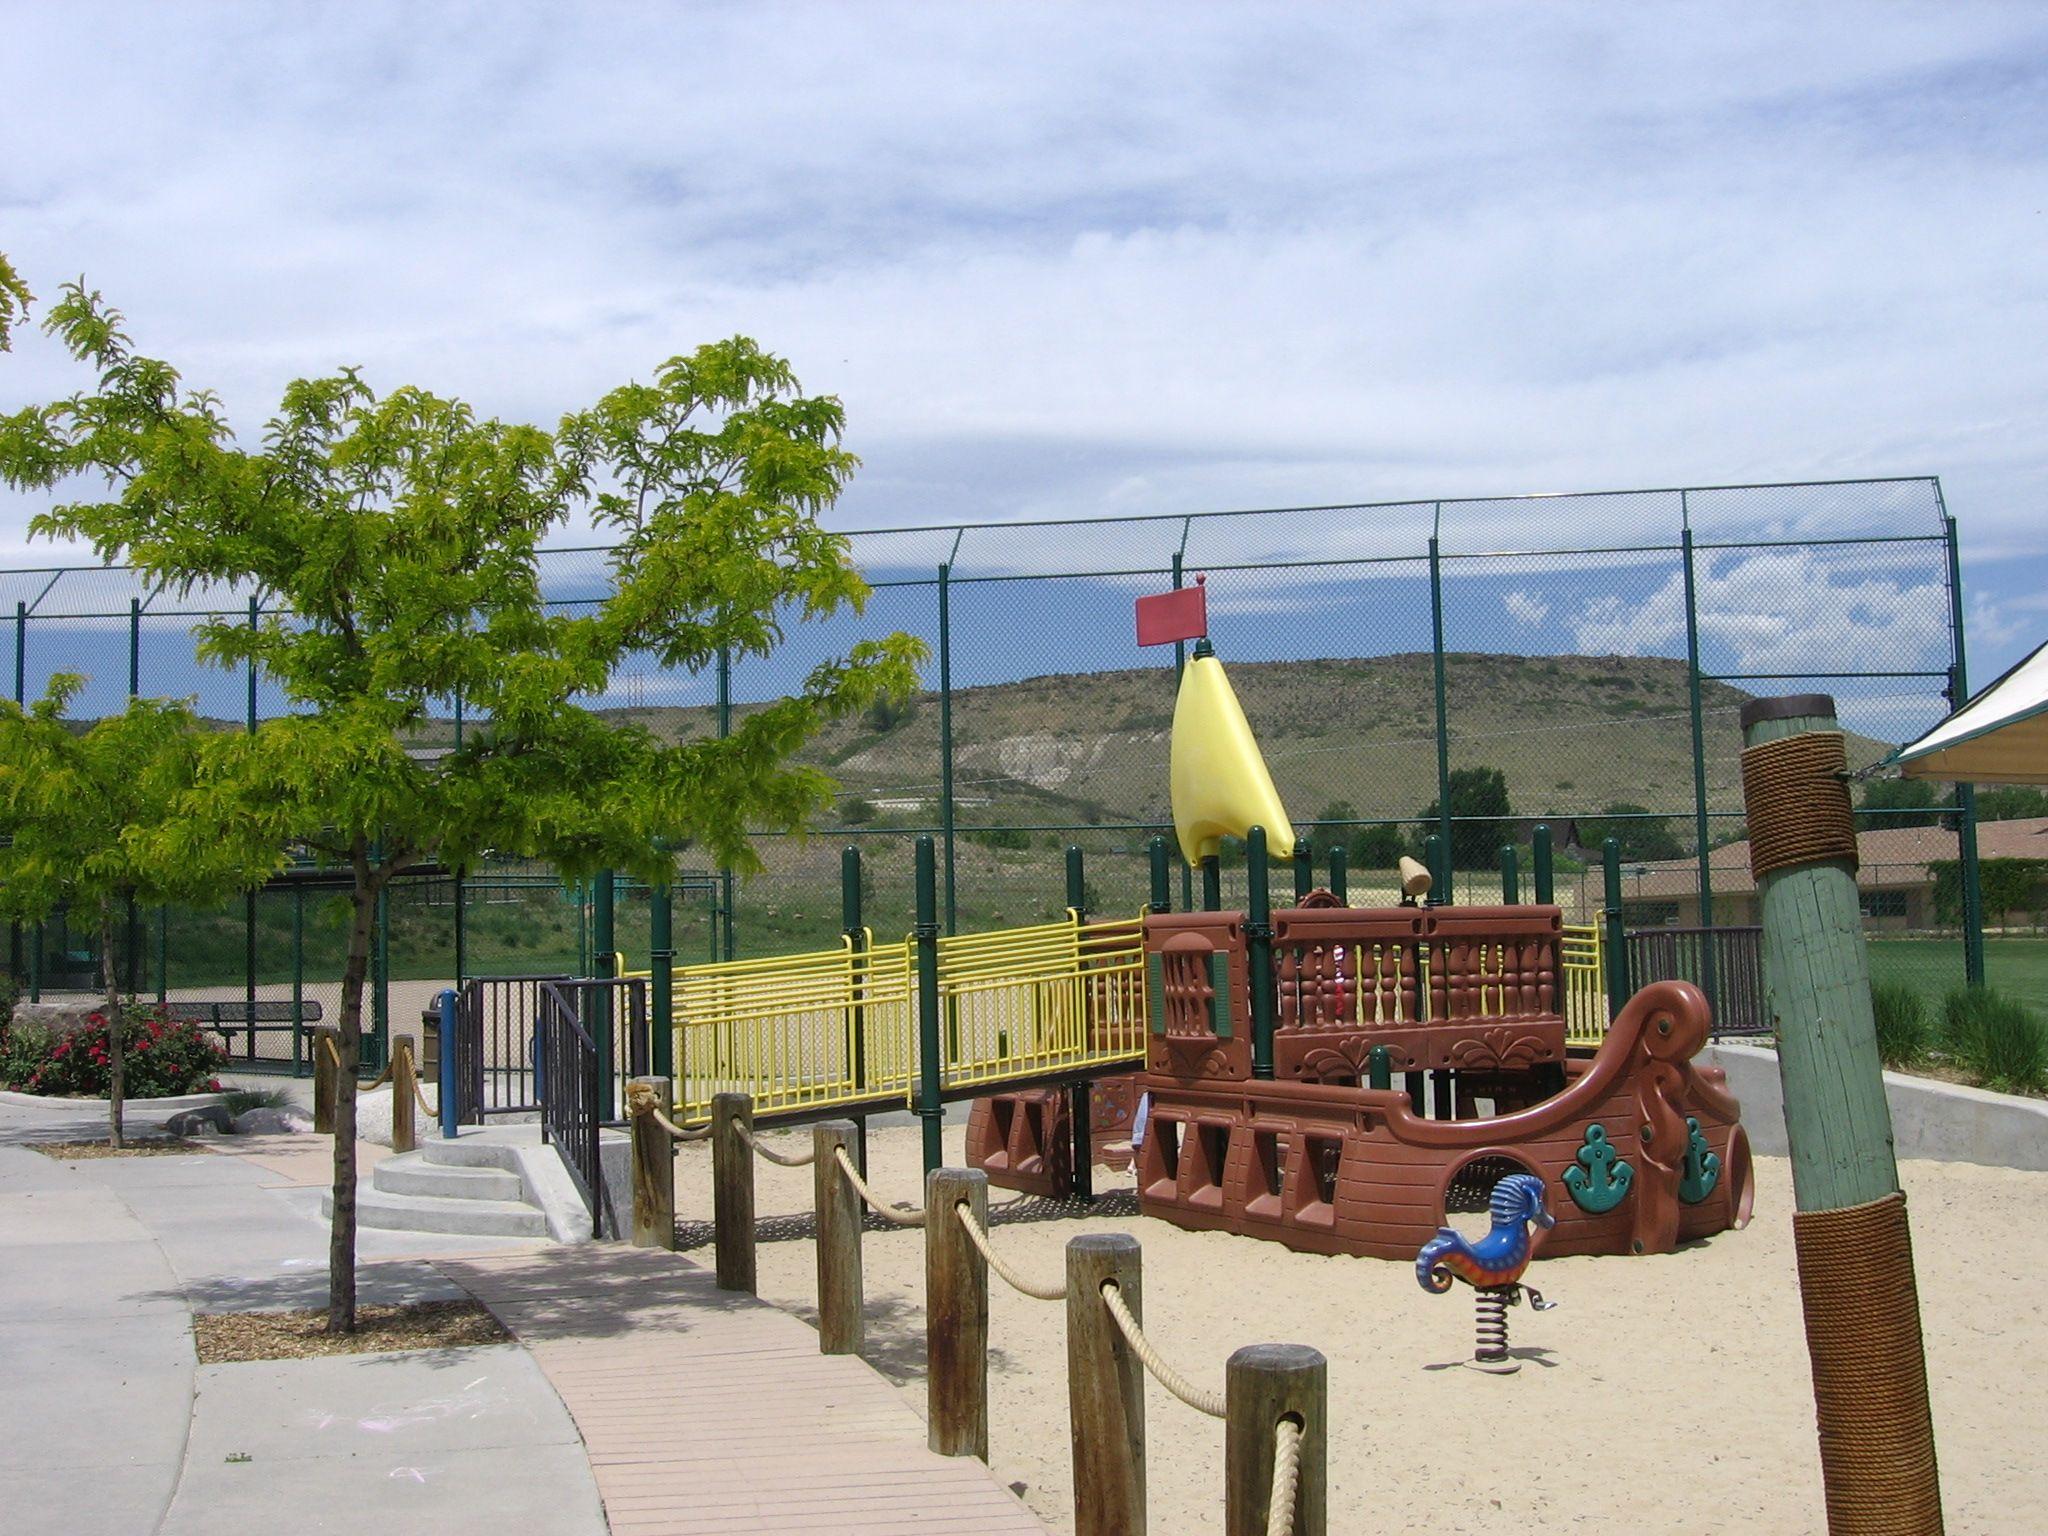 Tanglewood Park 13950 West 20th Avenue Golden Co Pirate Ship Playground Swings Tube Slides Picnic Shelter Park Swings Park Denver Parks